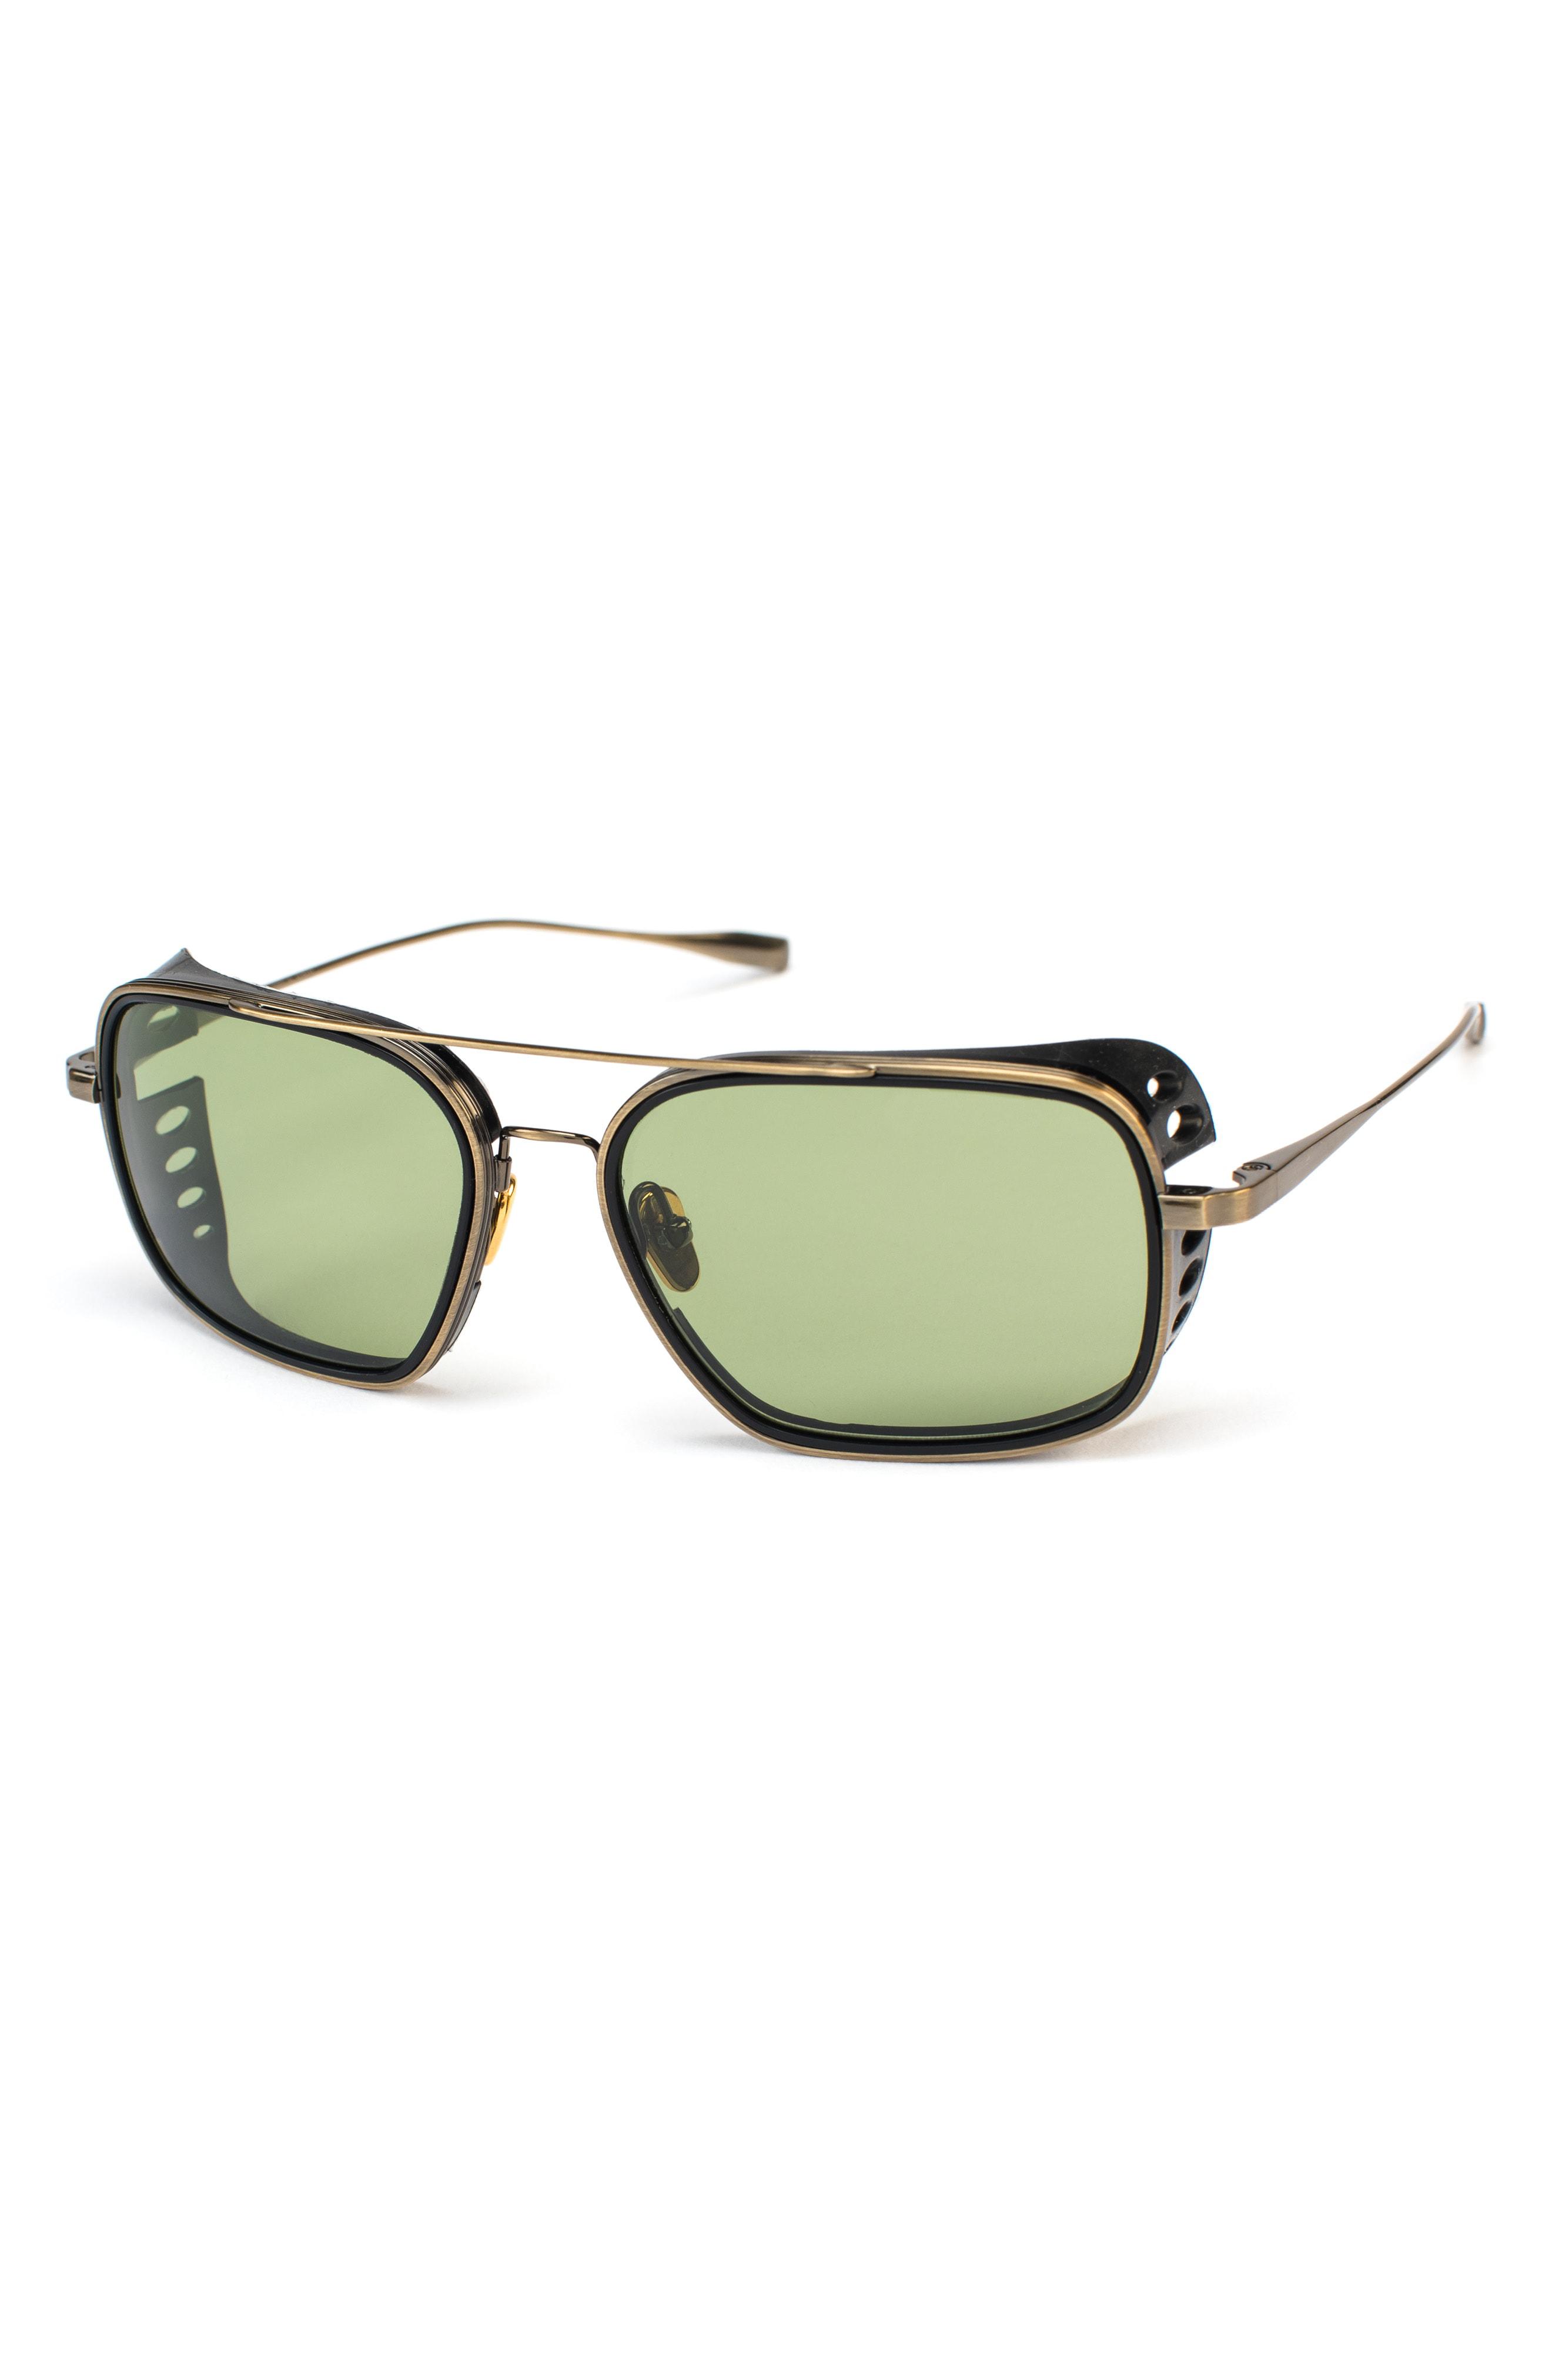 b6ebaaffff Salt. Voyager 56Mm Polarized Aviator Sunglasses - Antique Gold  Black Shield